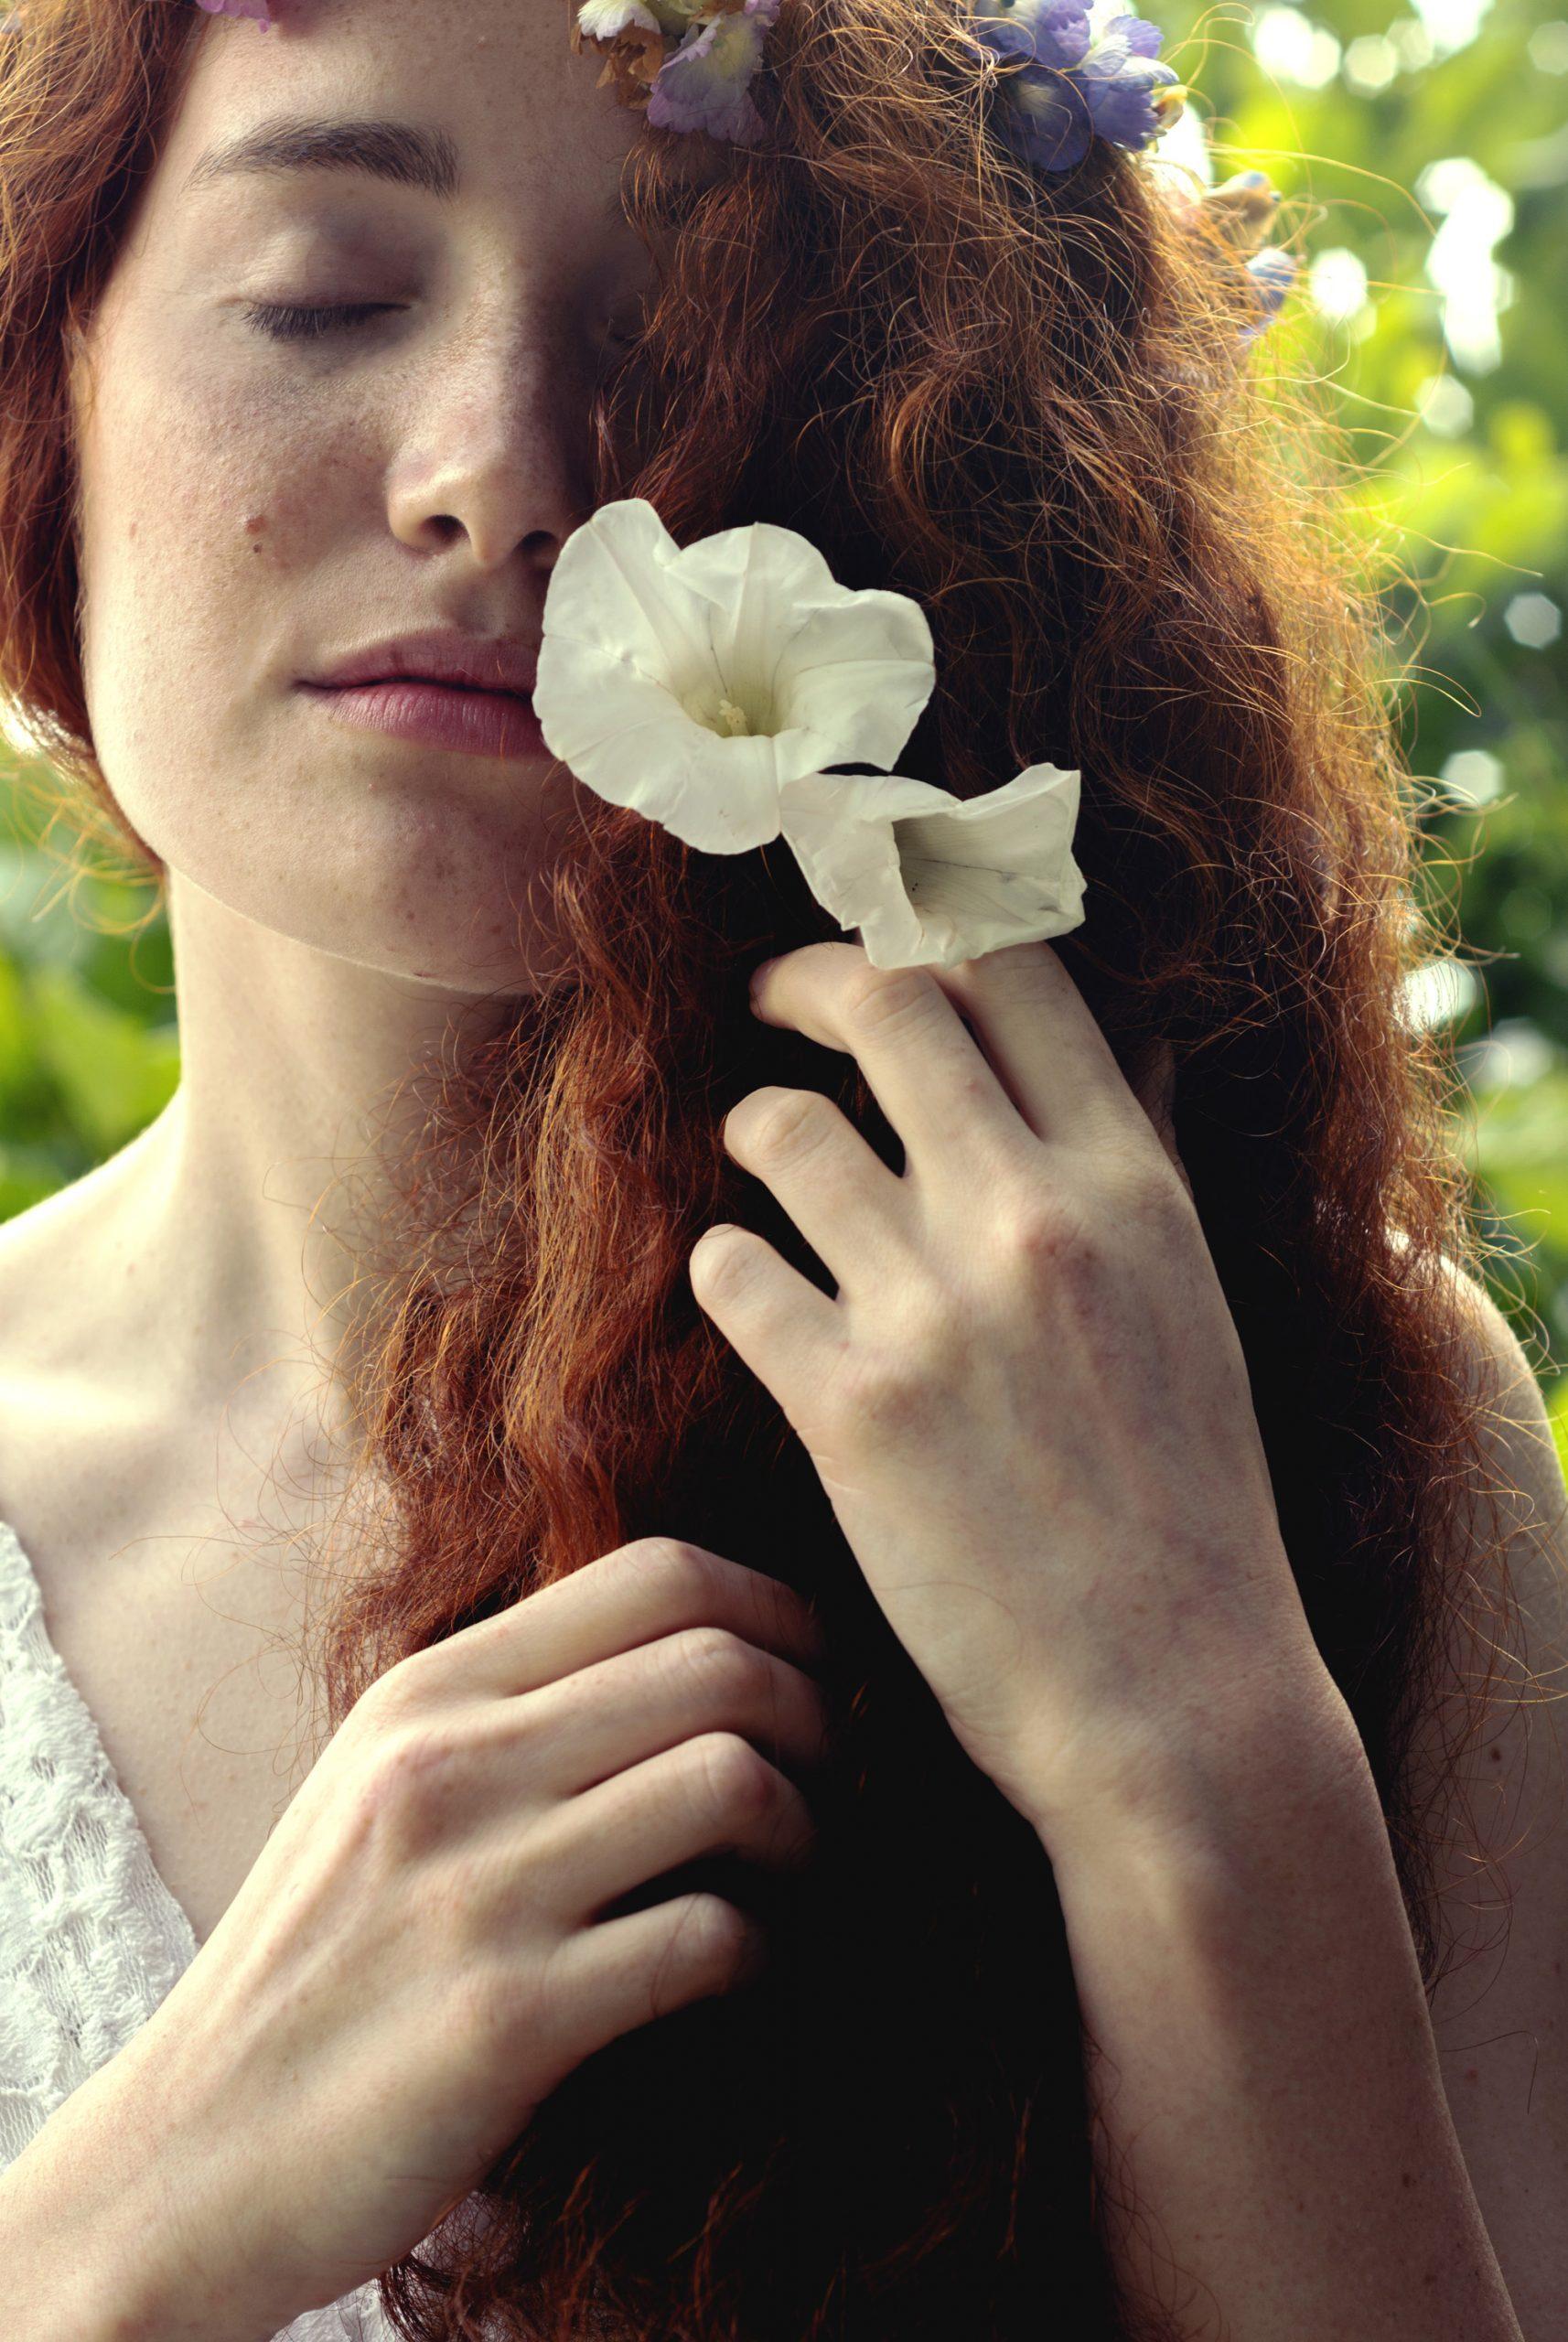 Categorie: Fashion, Glamour, Portrait; Photographer: LAURA AURIZZI; Model: ELENA EMILIANI; Mua: VALENTINA BRUCIAMETE; Location: Castel Gandolfo, RM, Italia